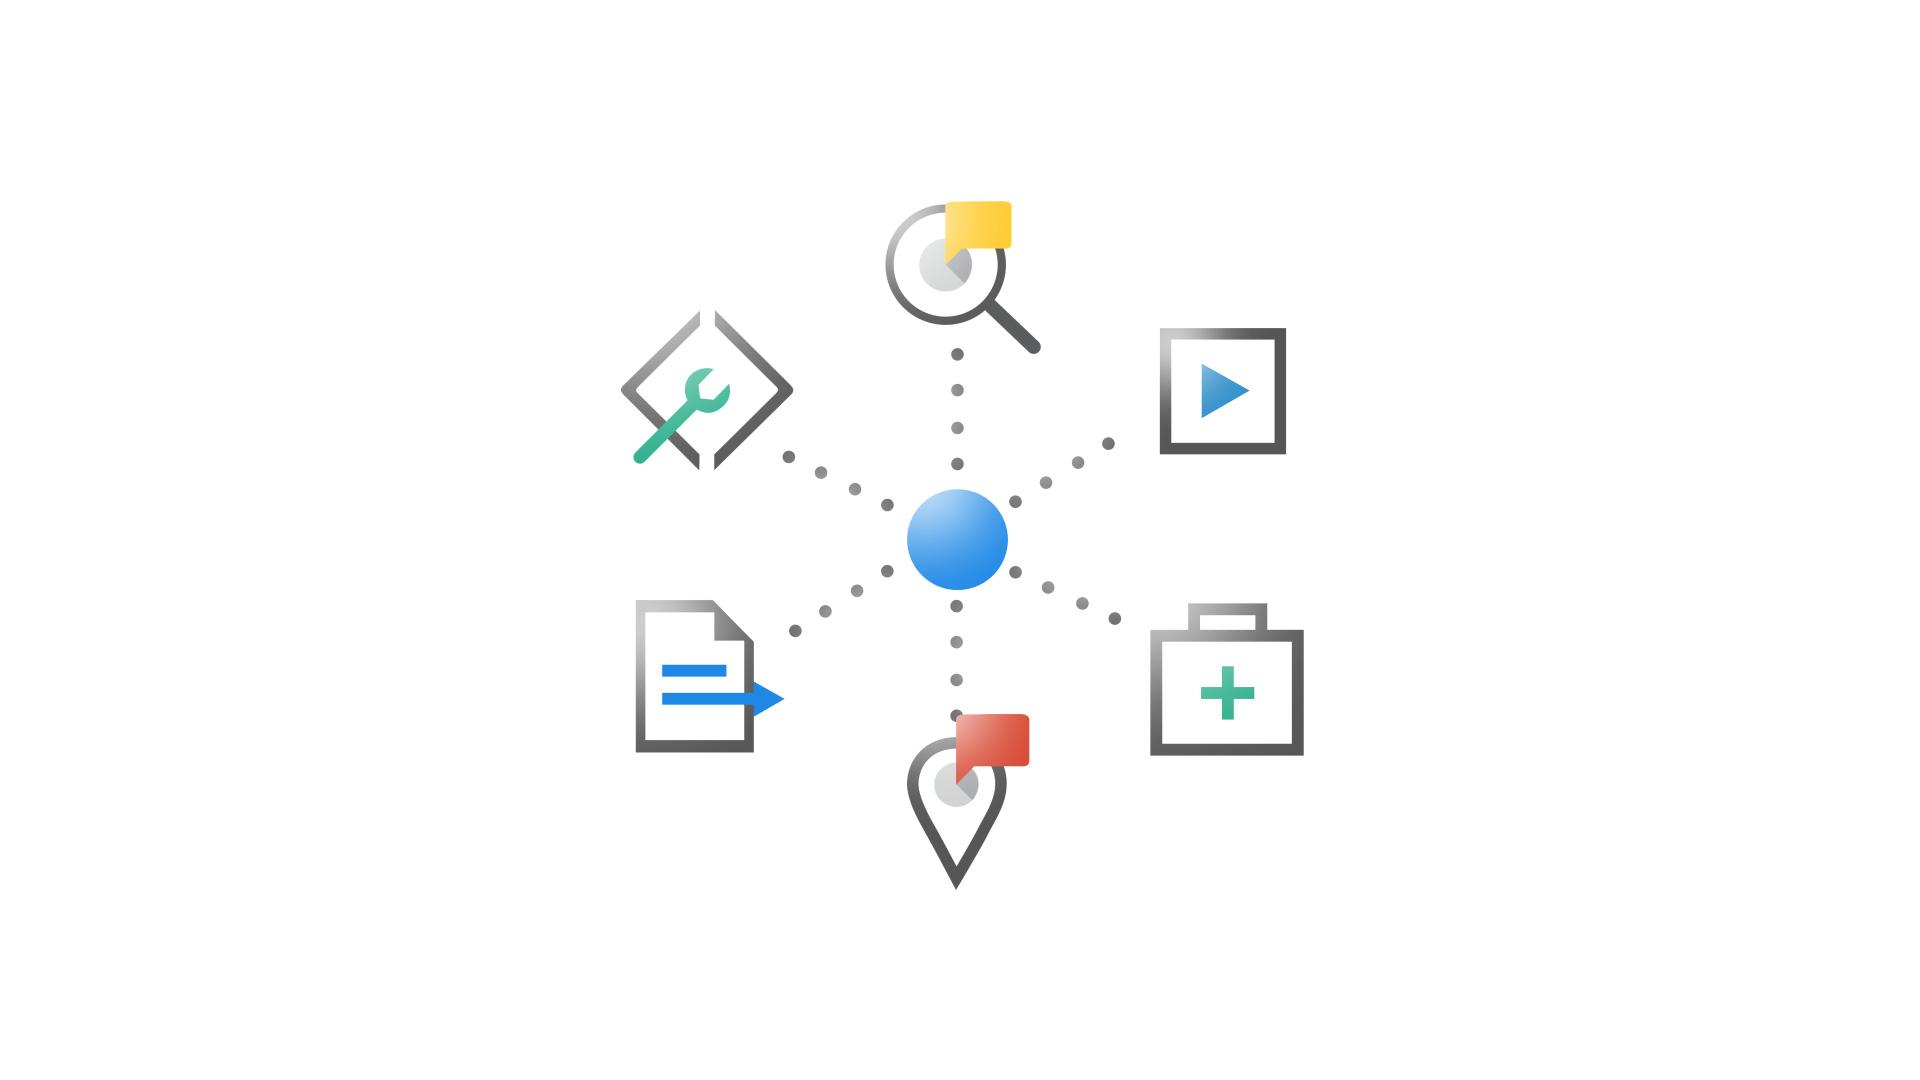 Google_Intro.jpg